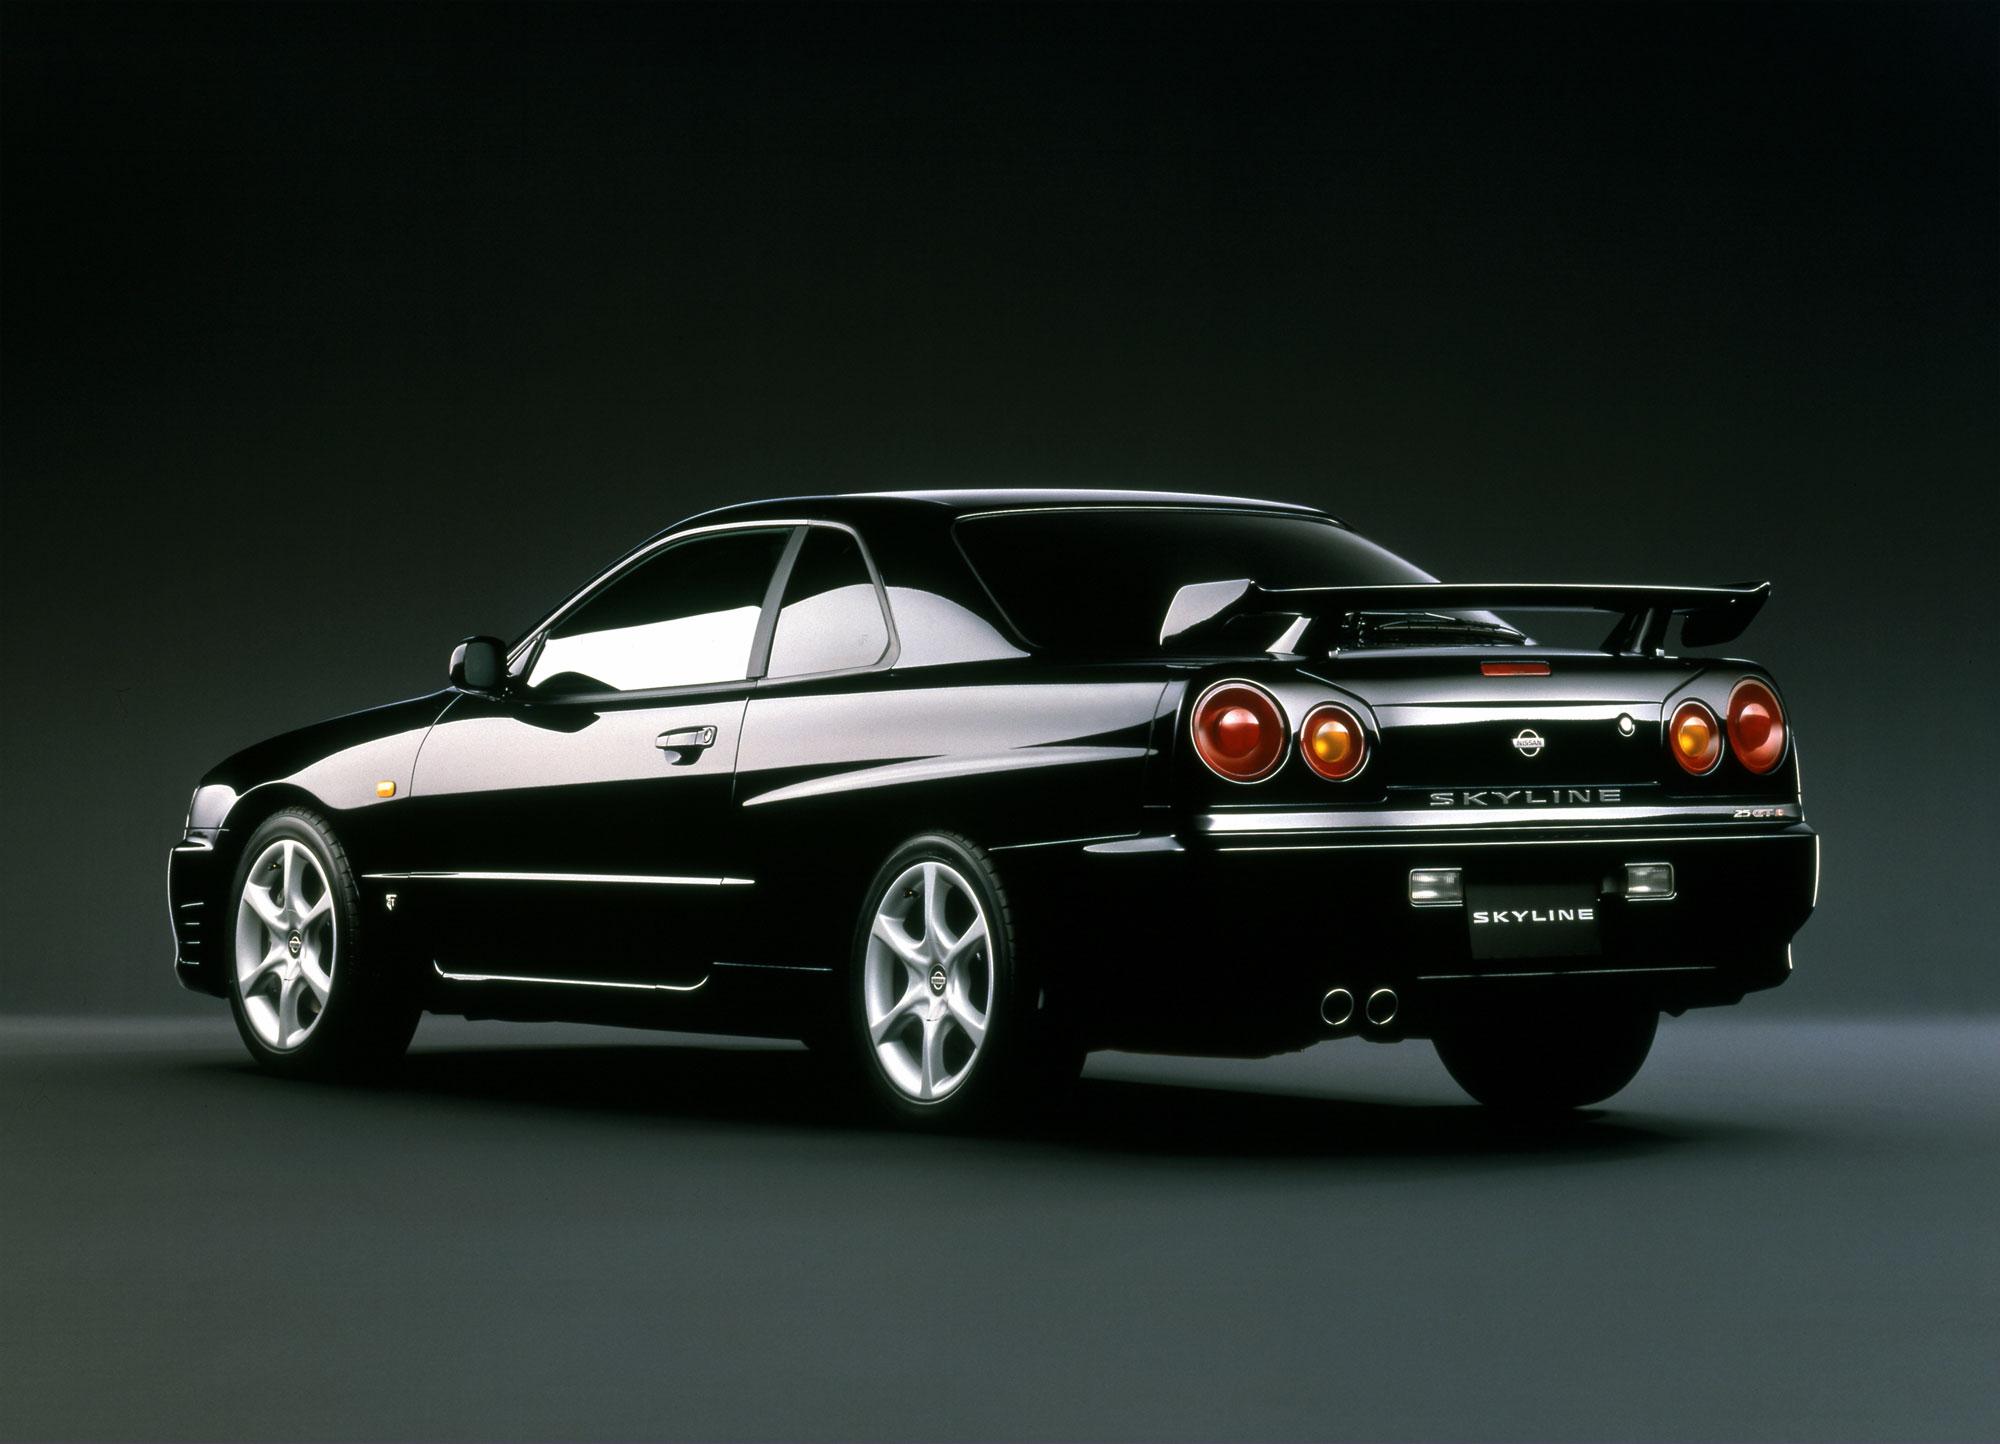 Nissan Skyline 25GT-Turbo - Photos, News, Reviews, Specs ...